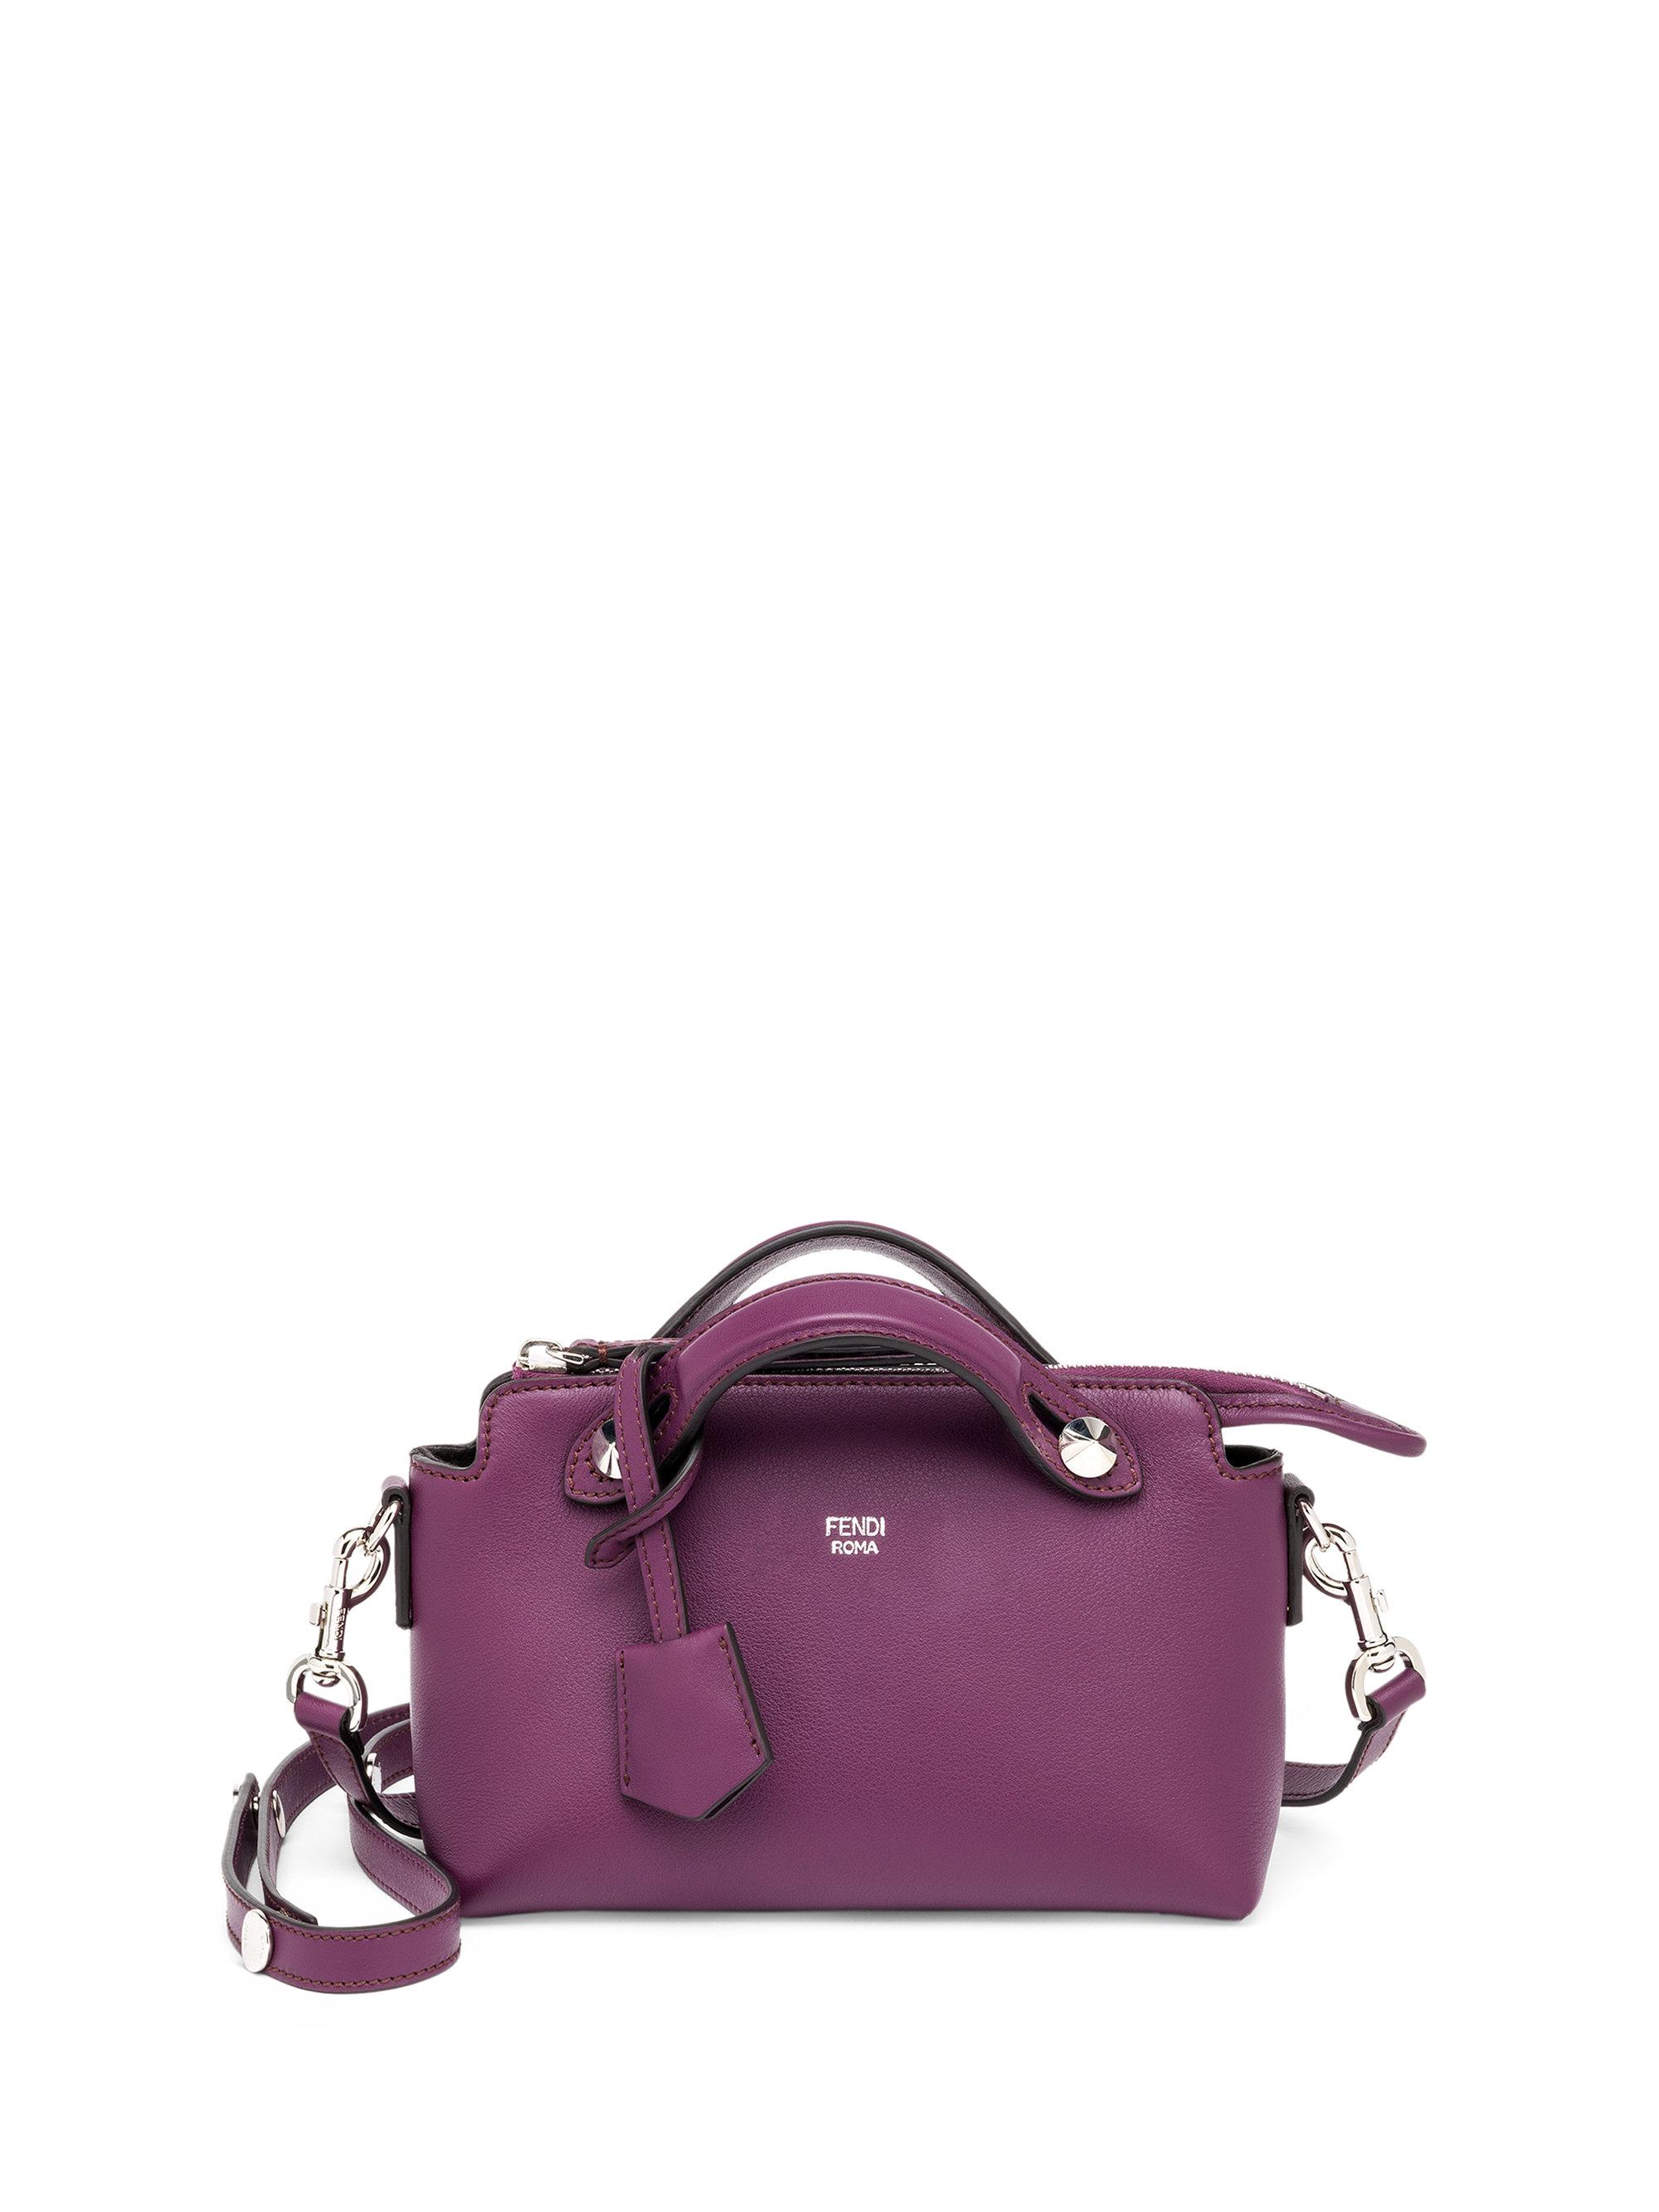 Fendi By The Way Mini Leather Satchel in Purple - Lyst